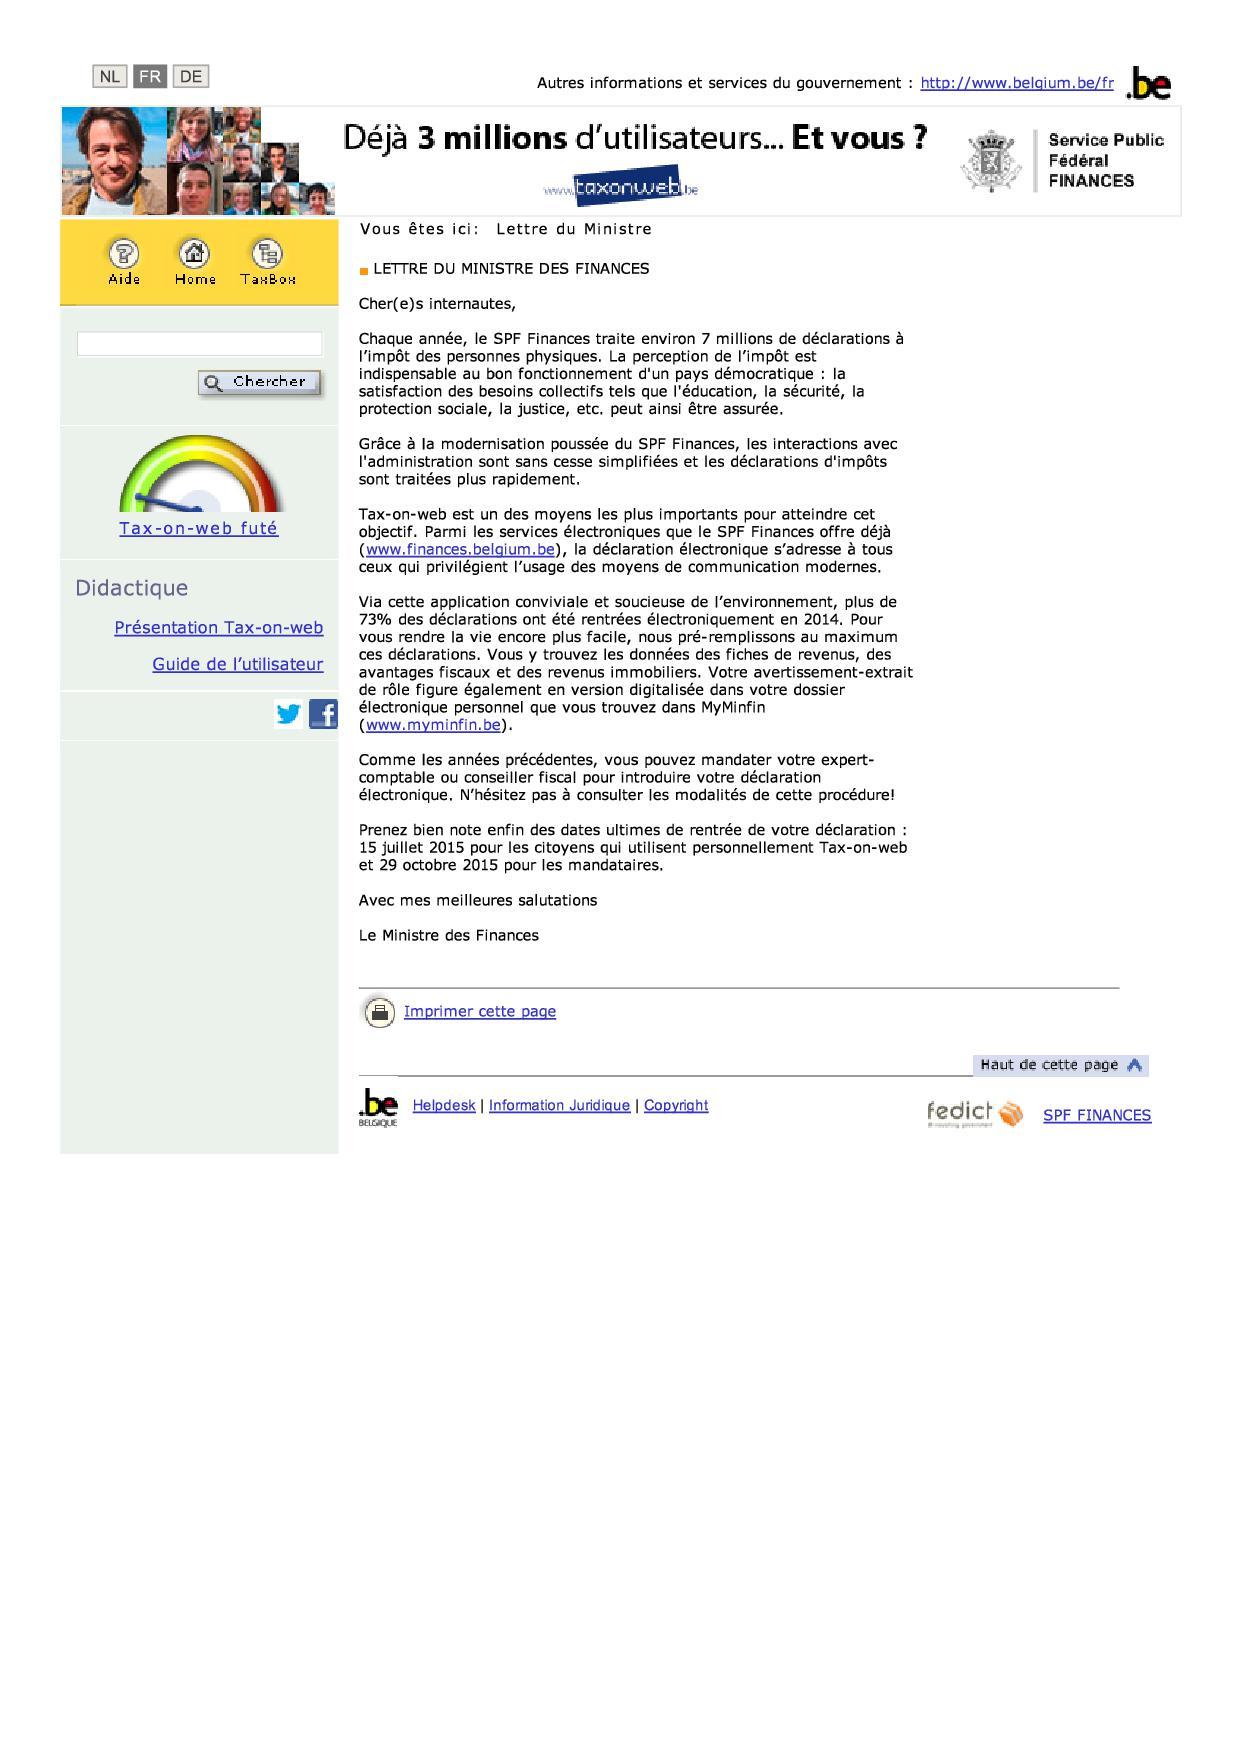 Delai Ipp Revenus 2014 Du 29 10 2015 Approche